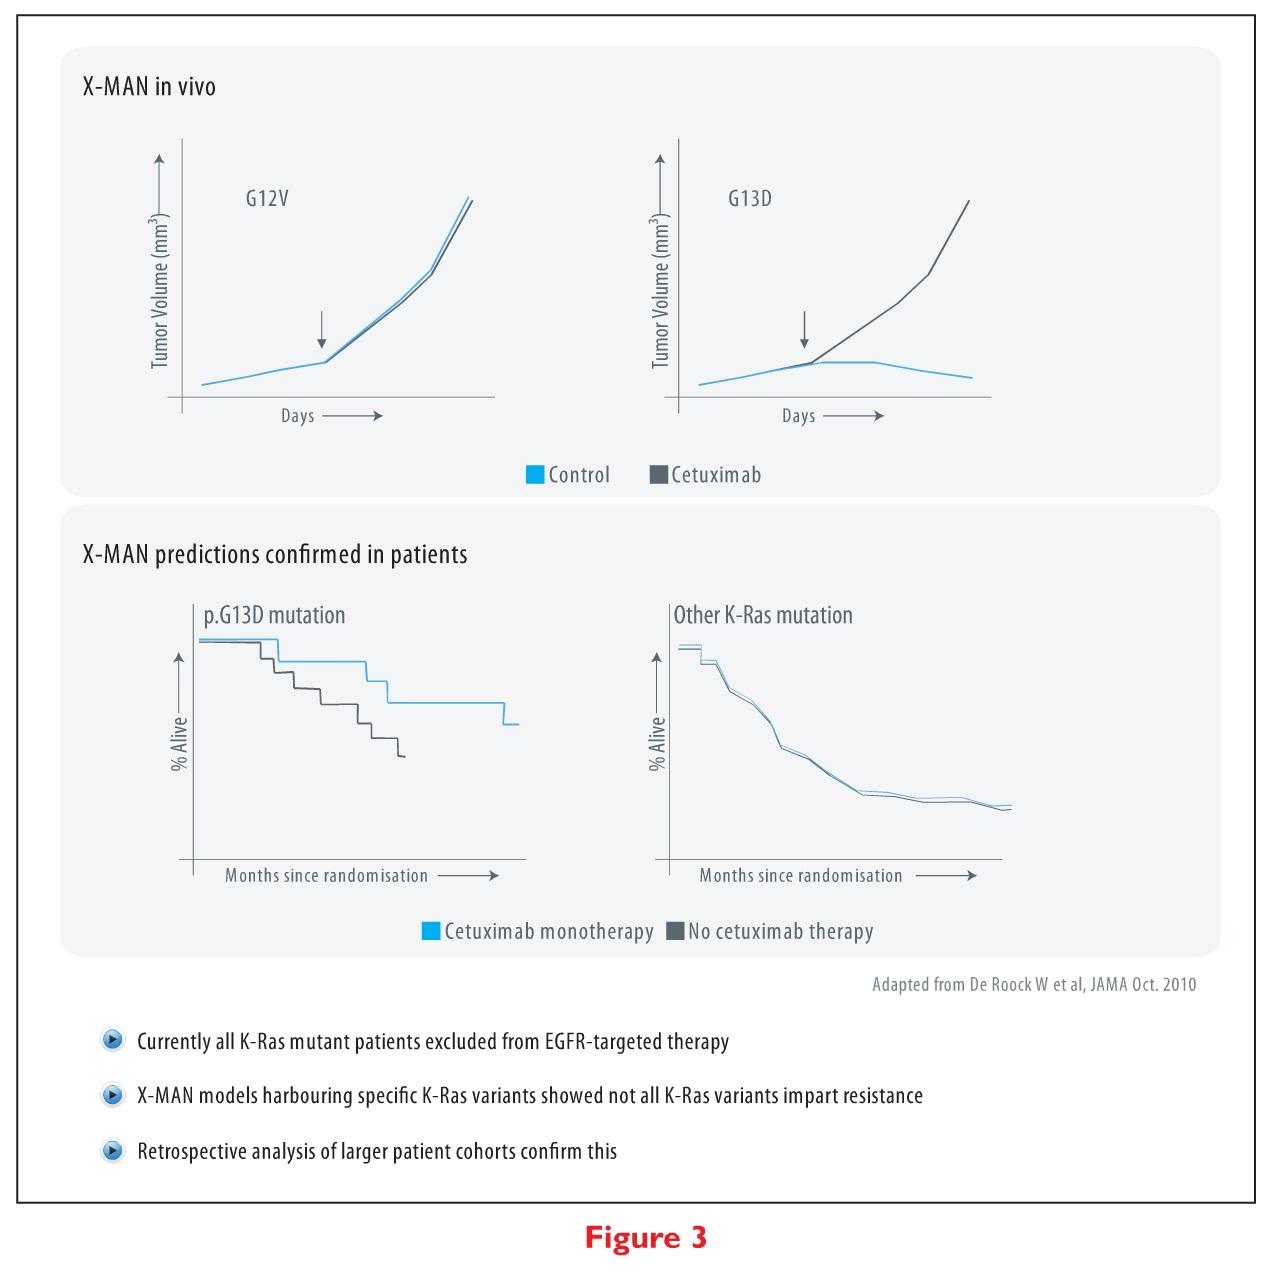 Figure 3 X-MAN in vivo & predictions confirmed in patients